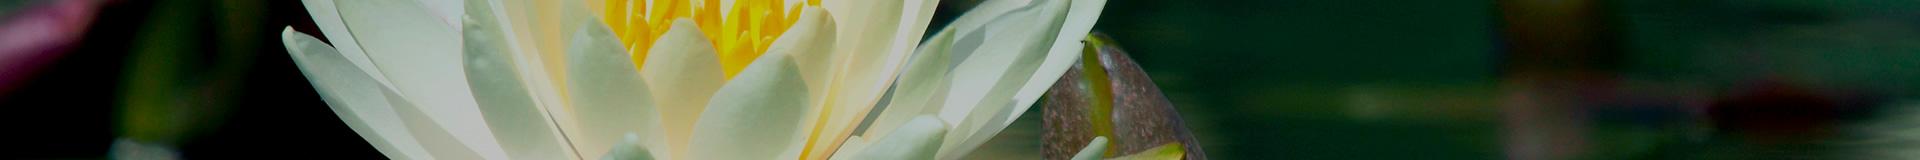 Resources | Thibodaux Funeral Home Inc.